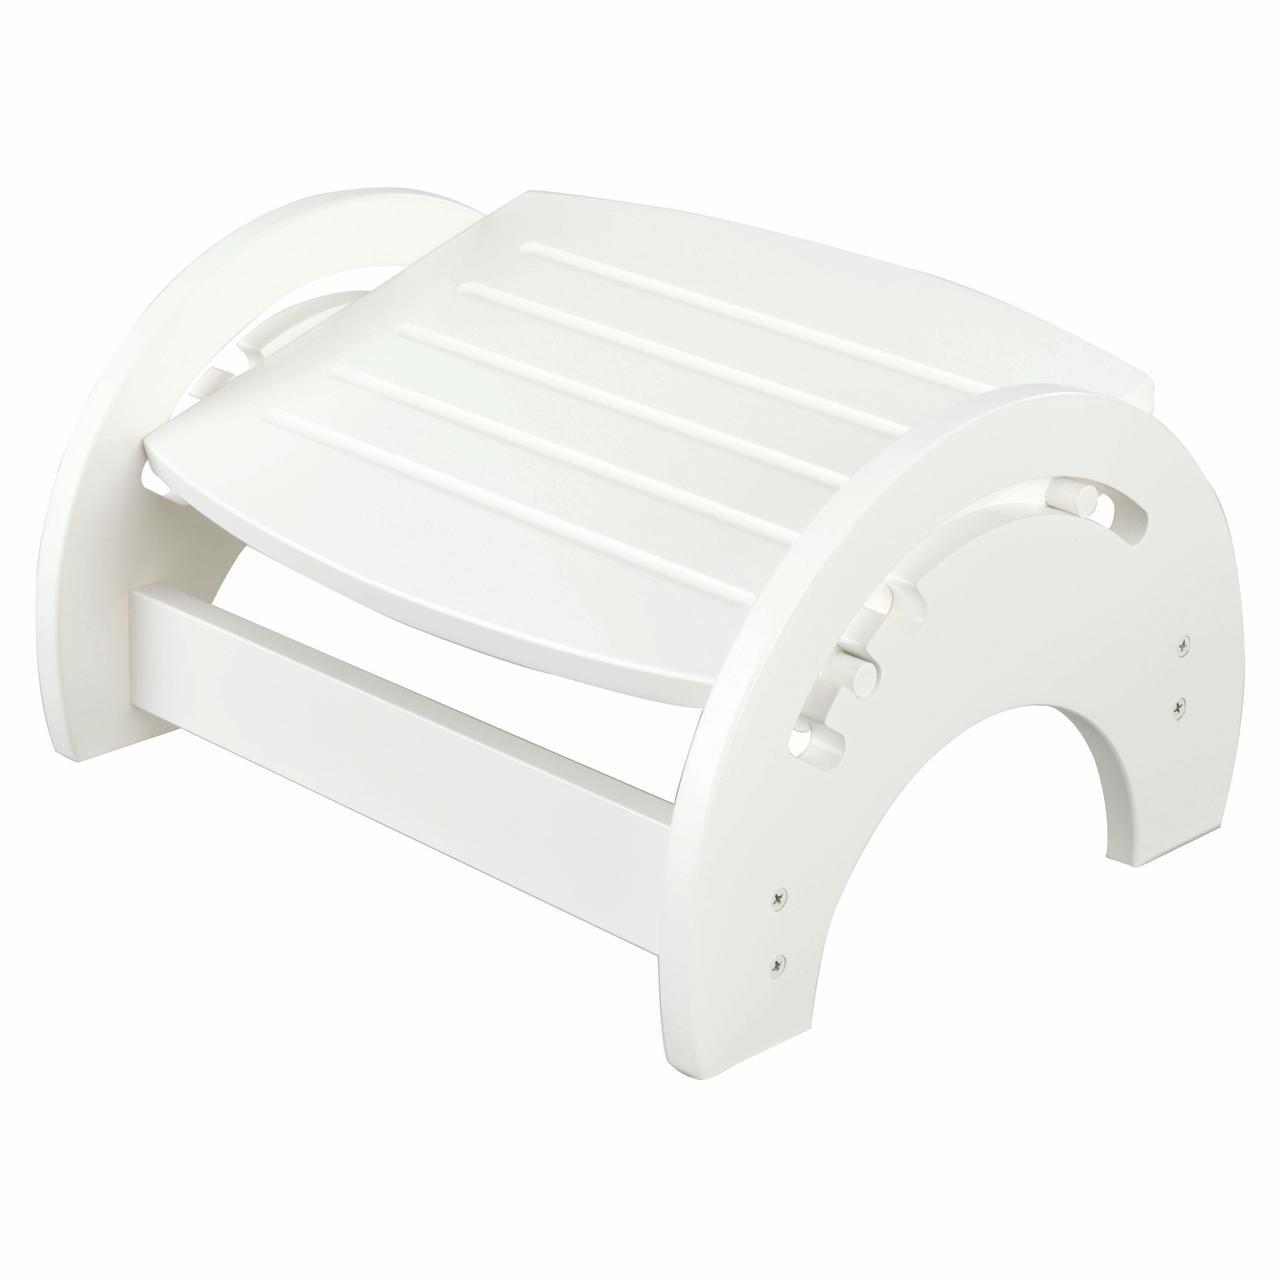 KidKraft Wooden Adjustable Footstool for Nursing with Anti-Slip Pads on Base - White